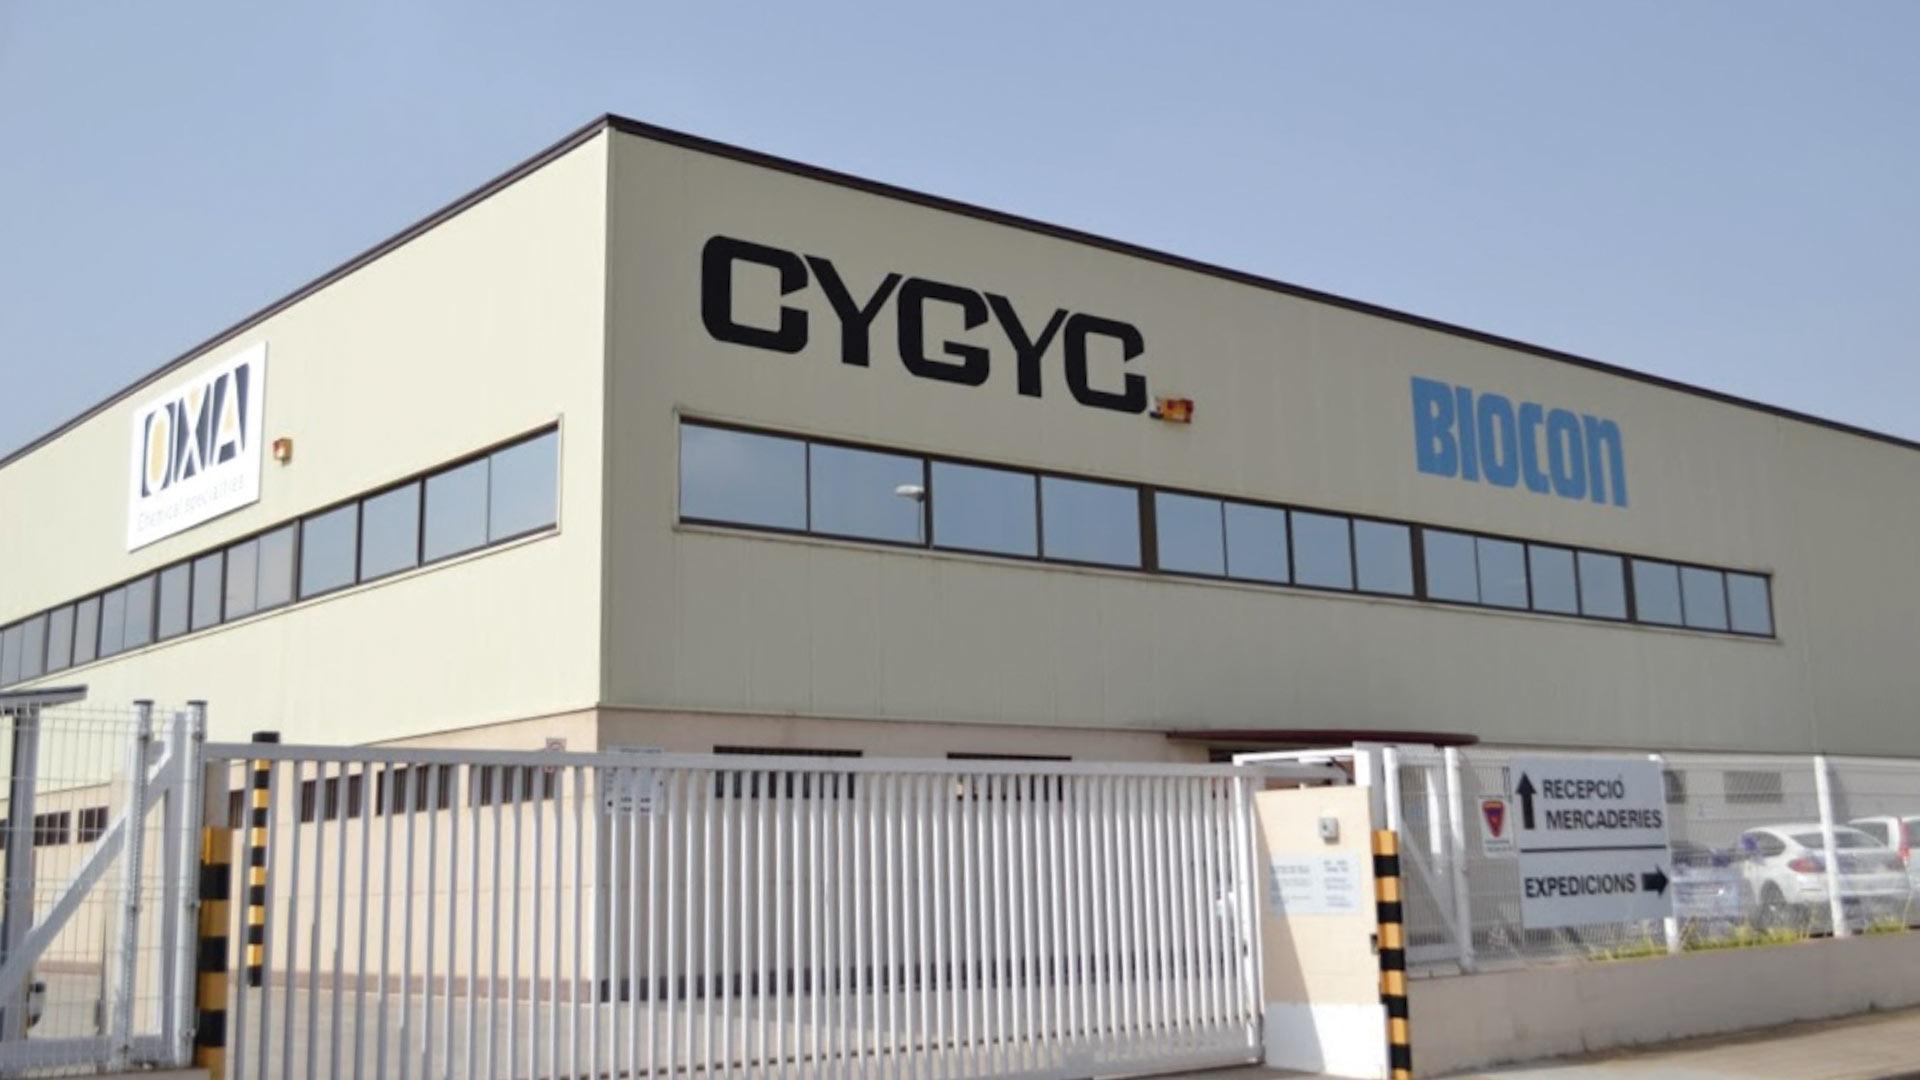 Nave industrial prefabricada de Cygyc